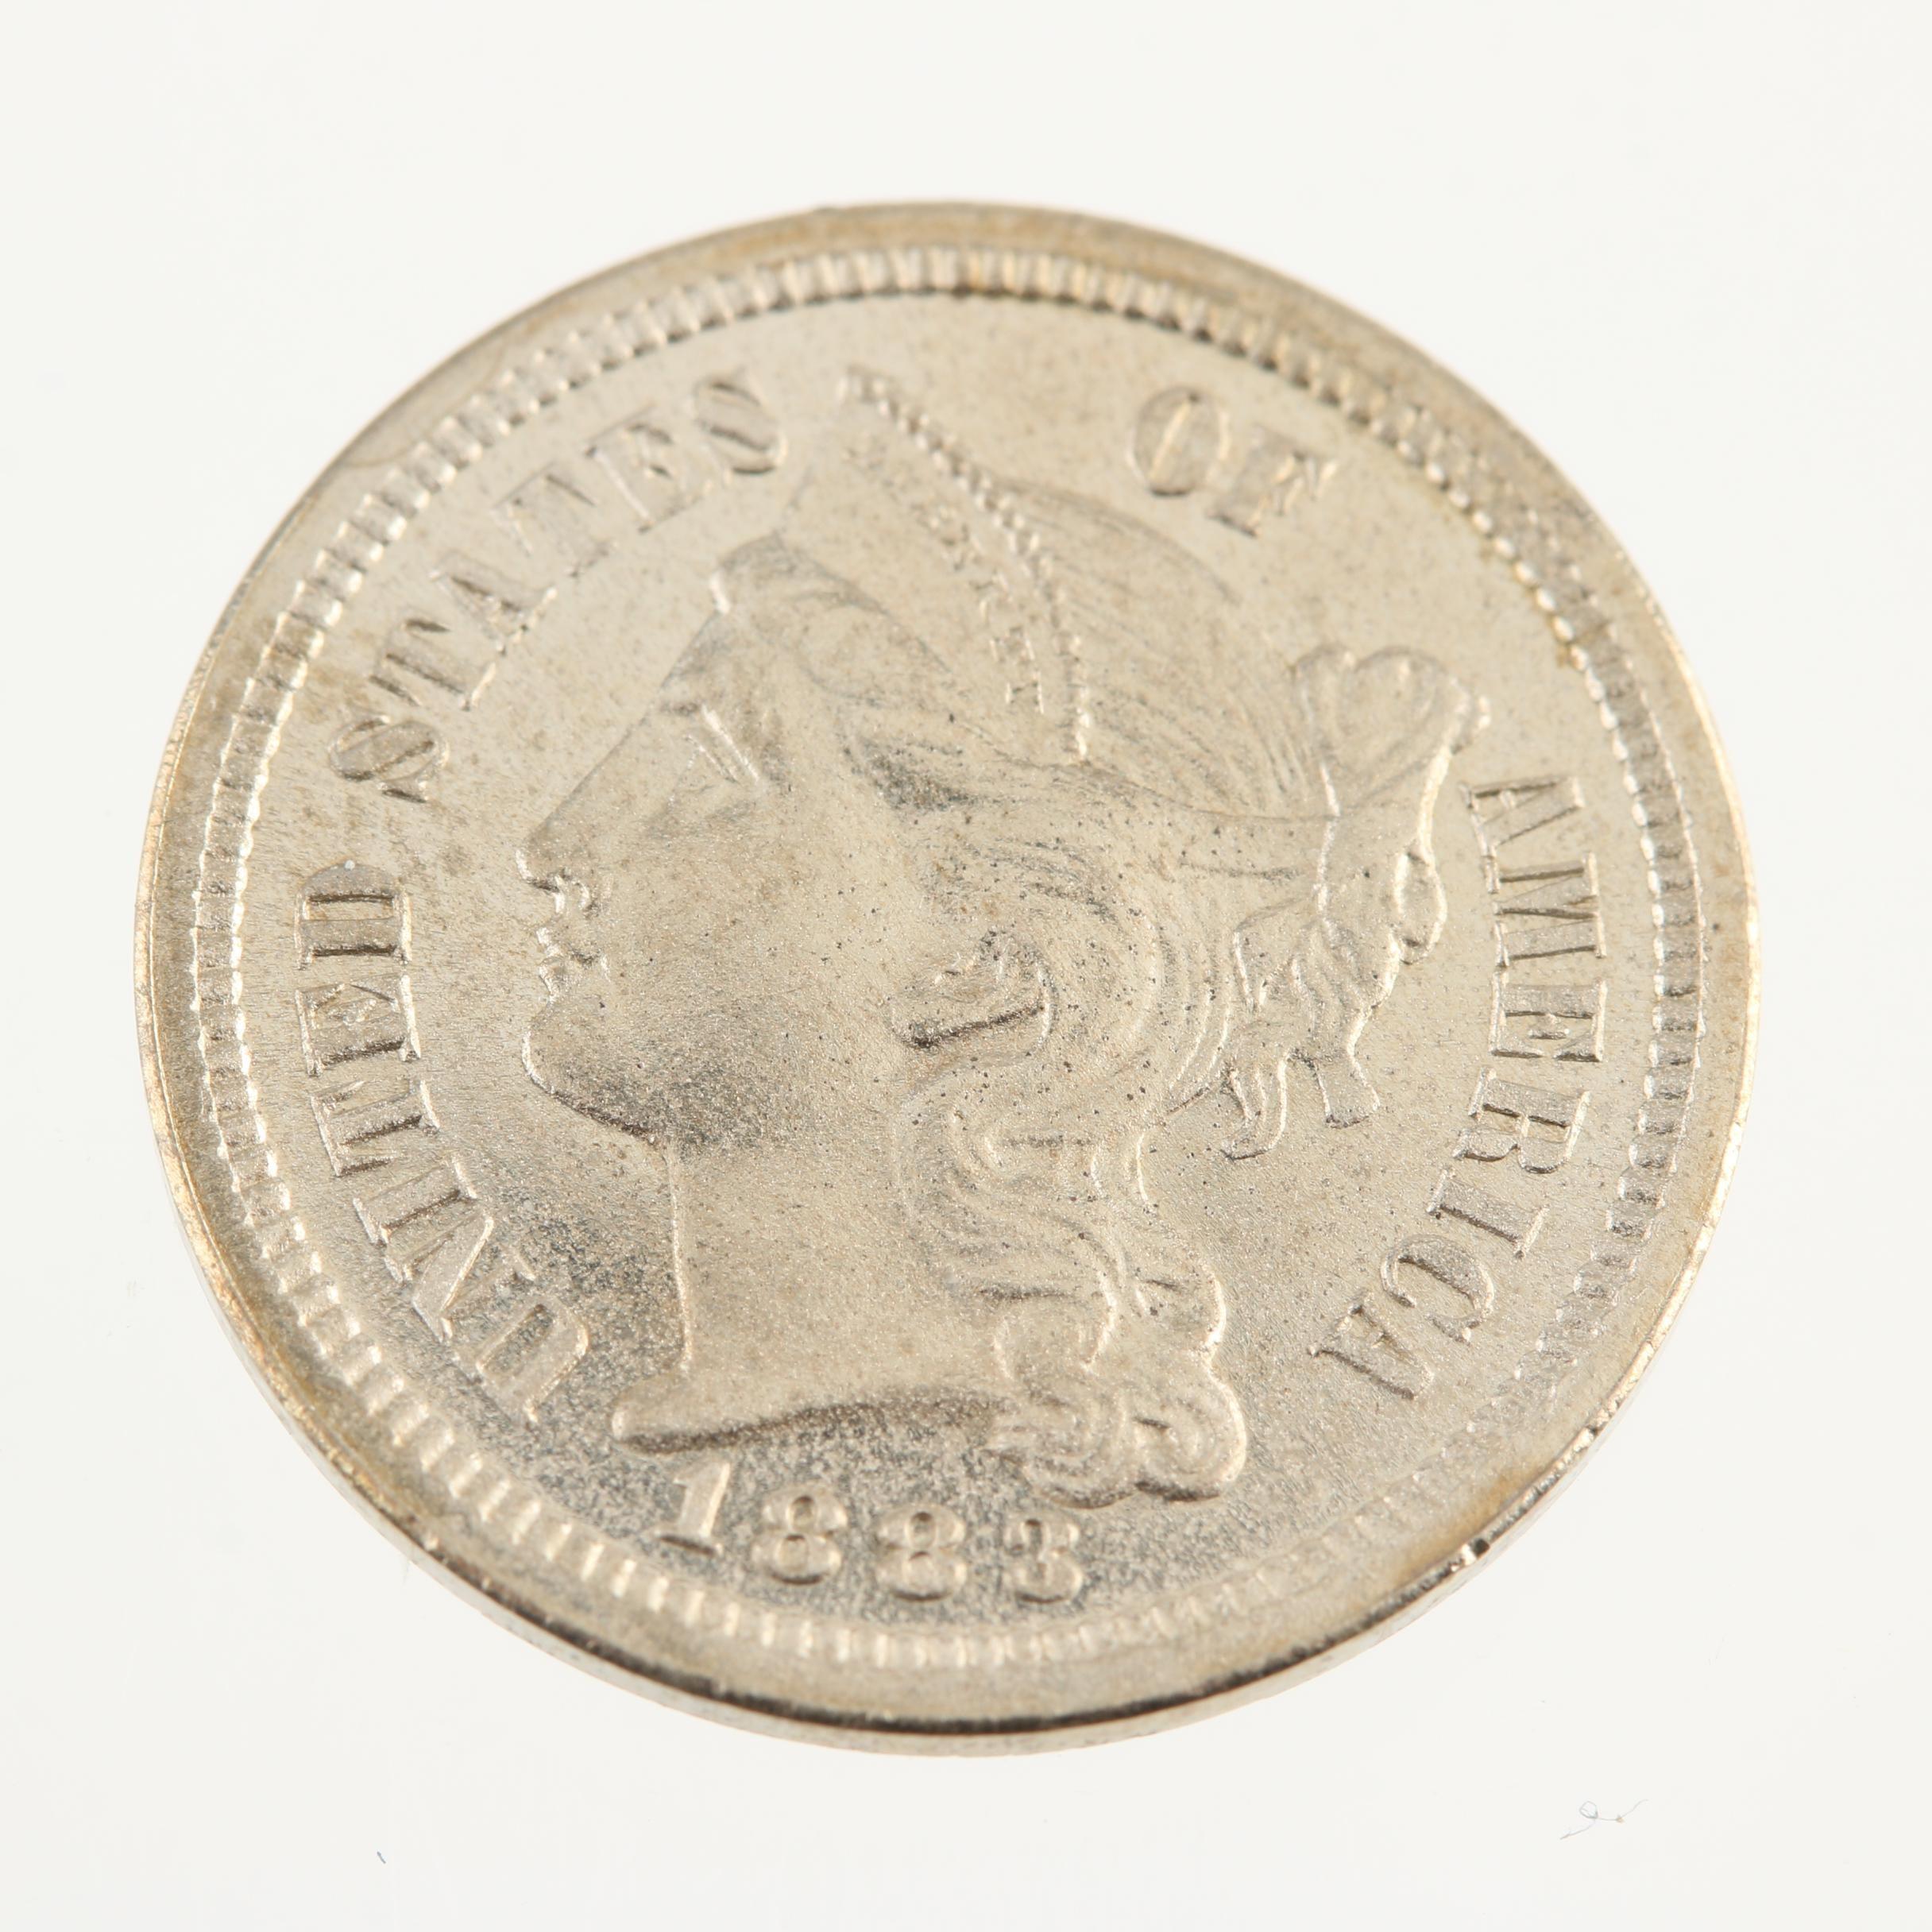 1883 Three Cent Liberty Head Proof Nickel Coin